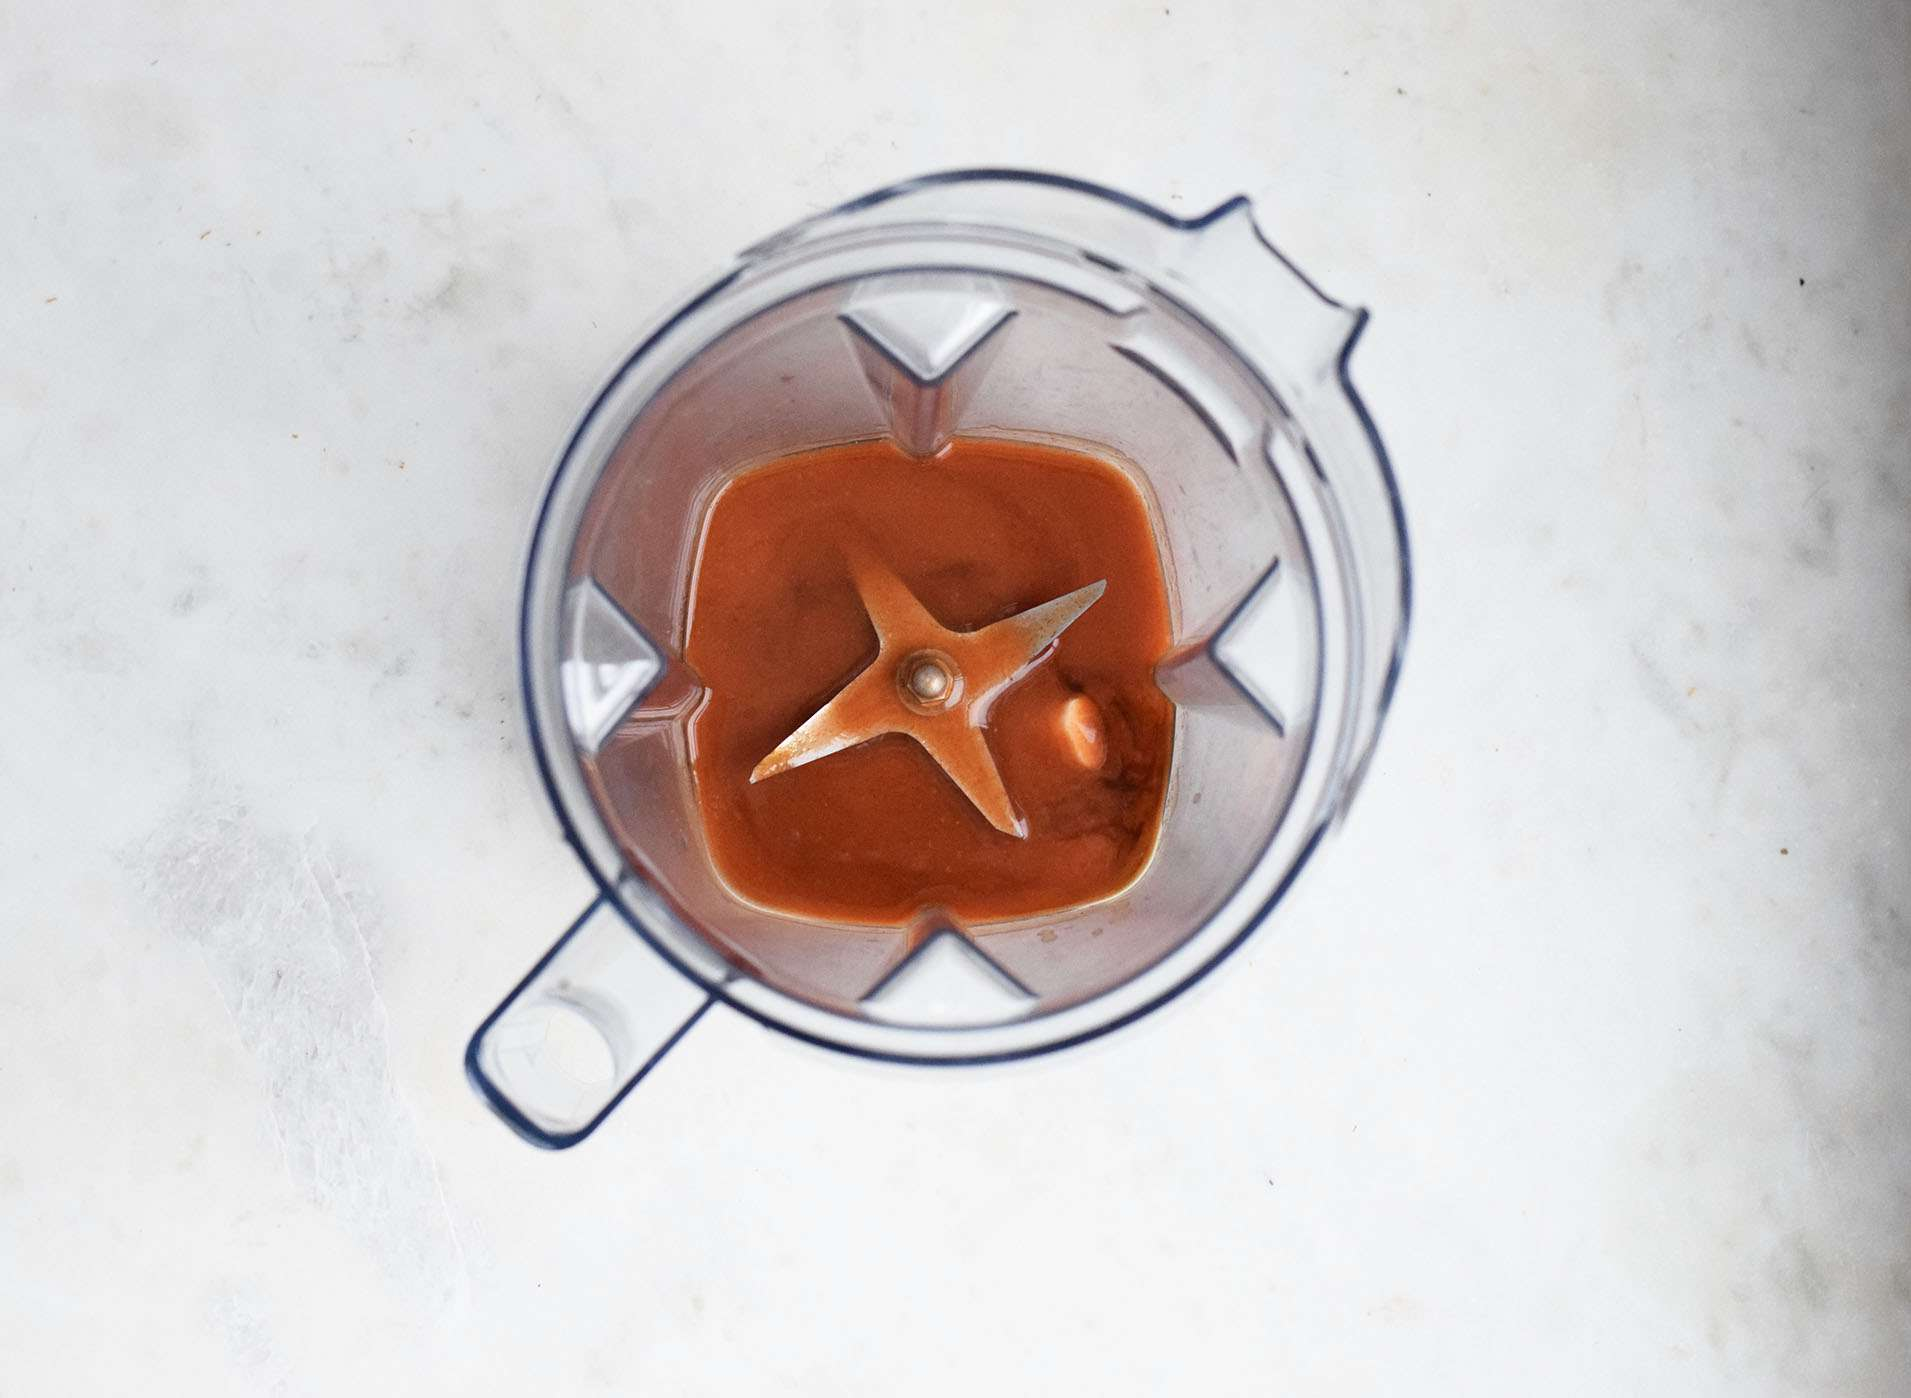 wing sauce ingredients in a blender